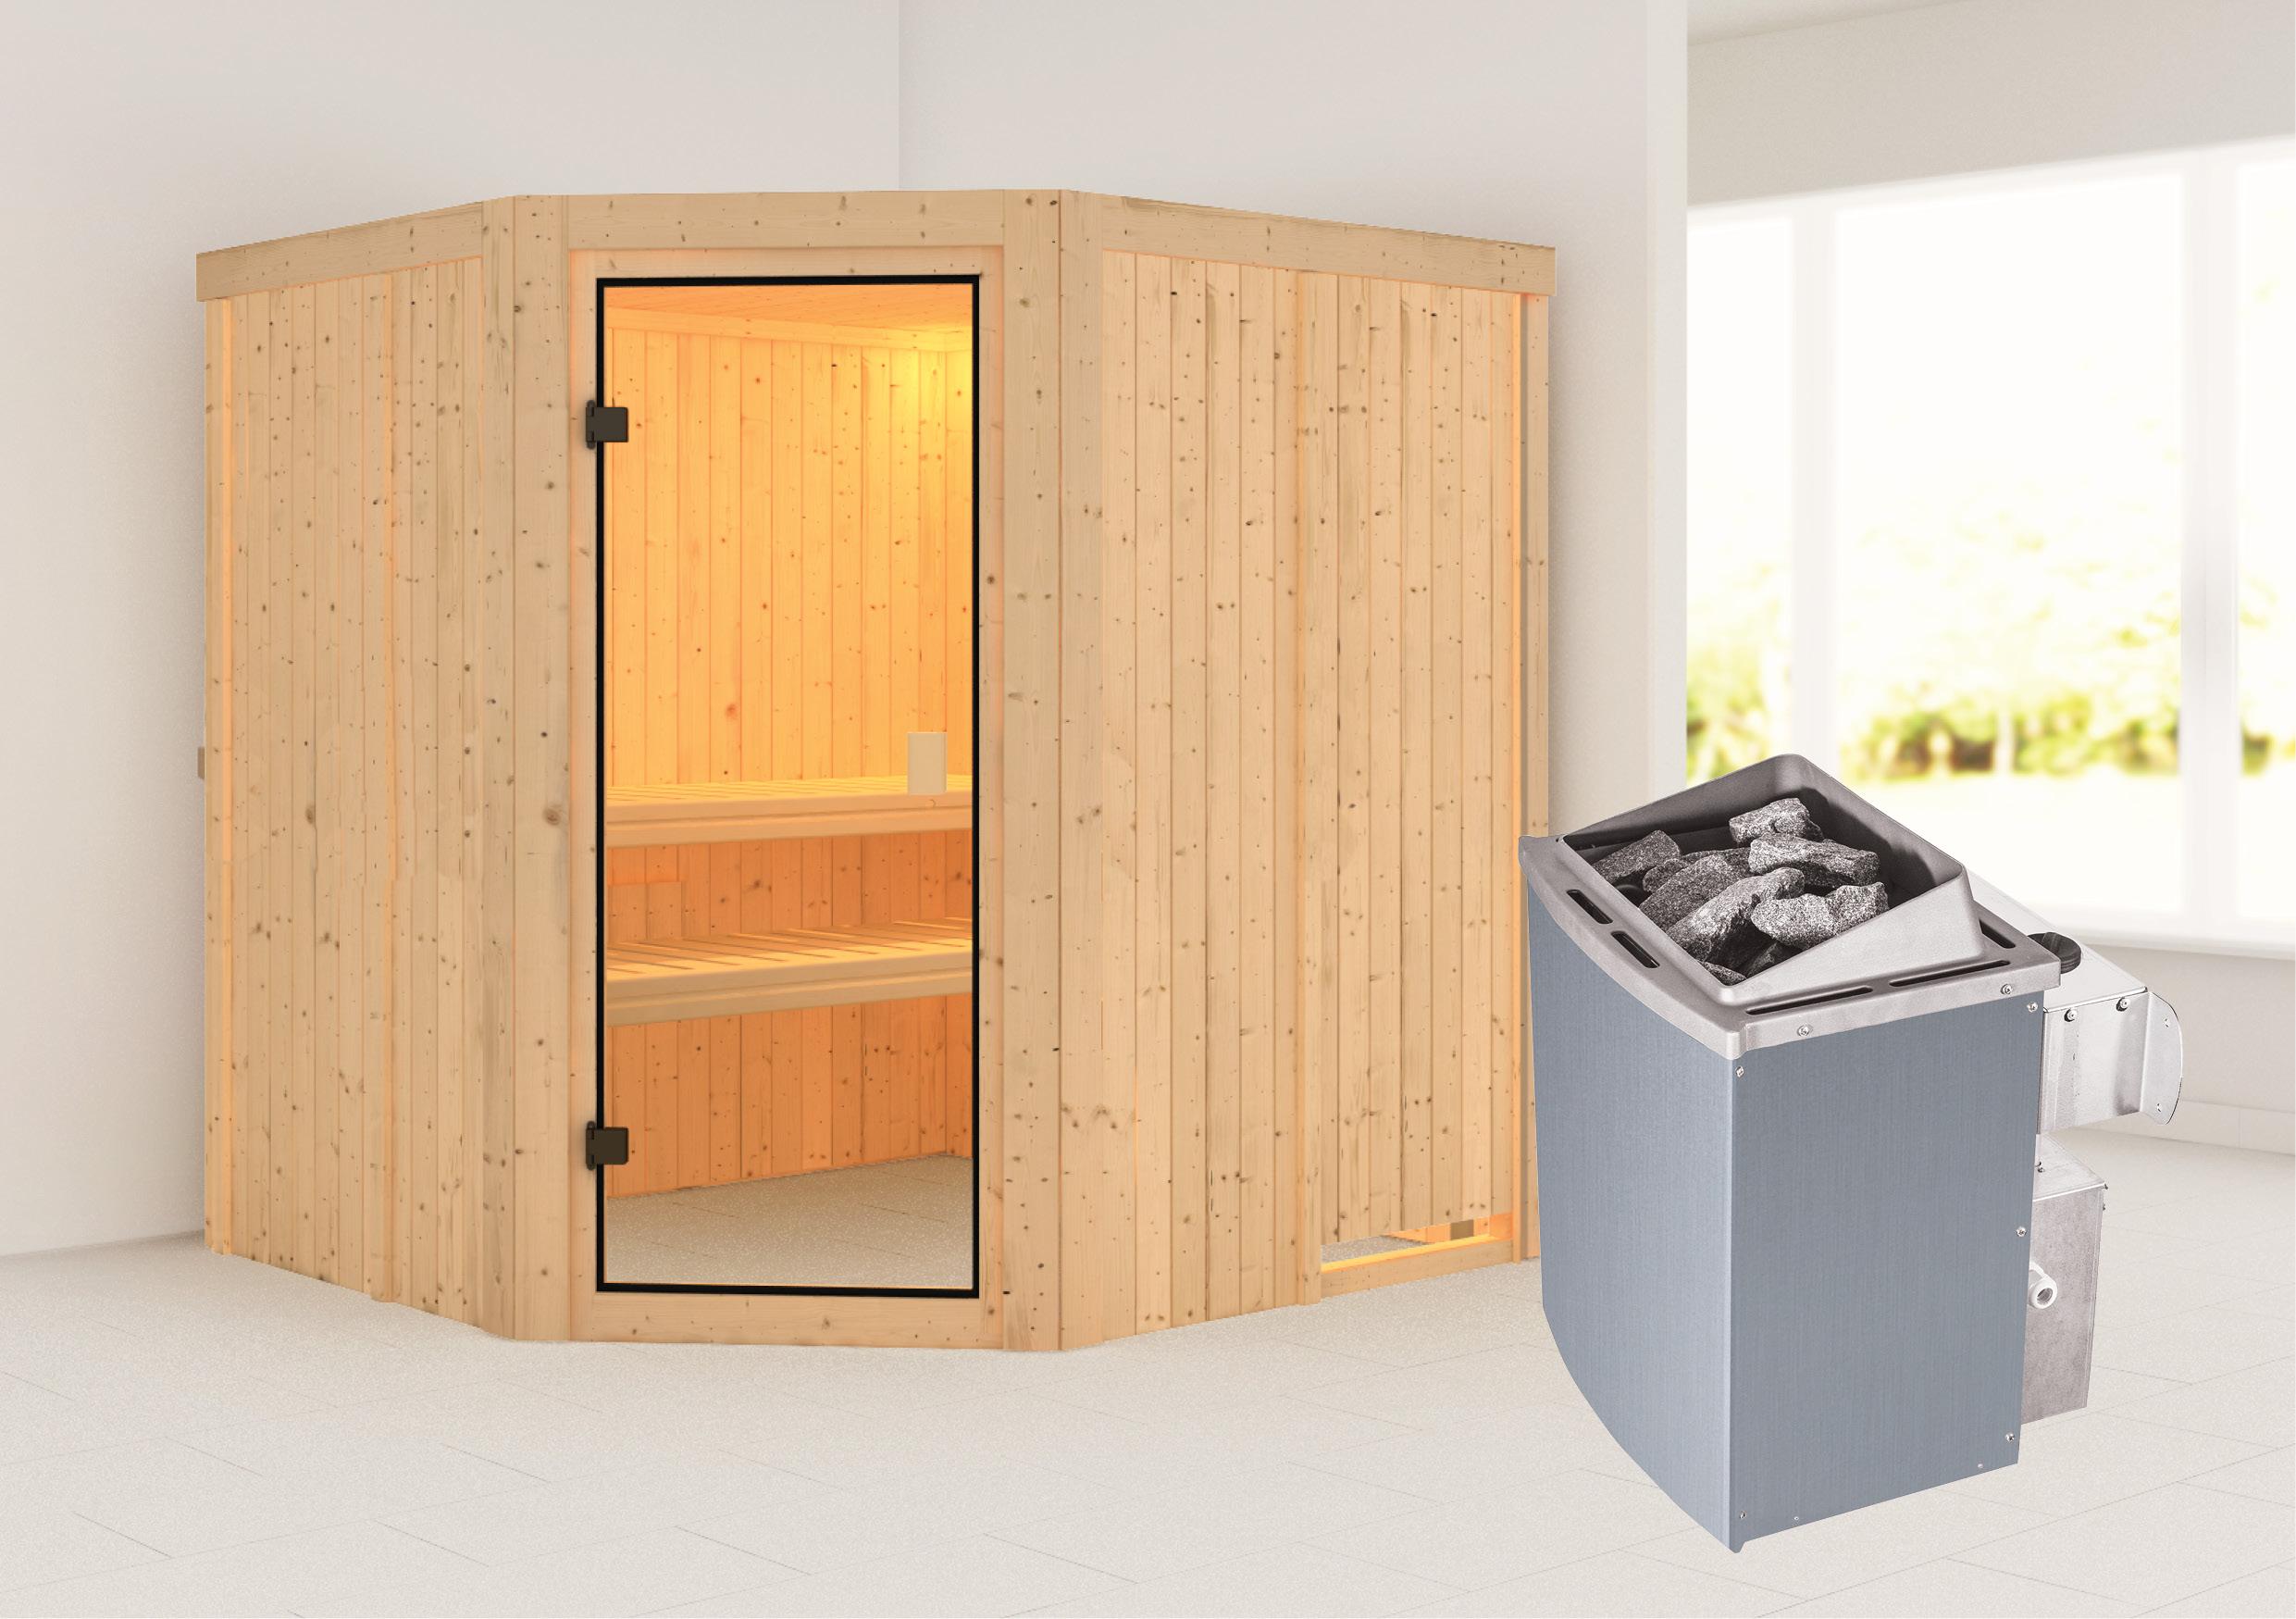 Woodfeeling Sauna Bodo 68mm Saunaofen 9kW intern Bild 1